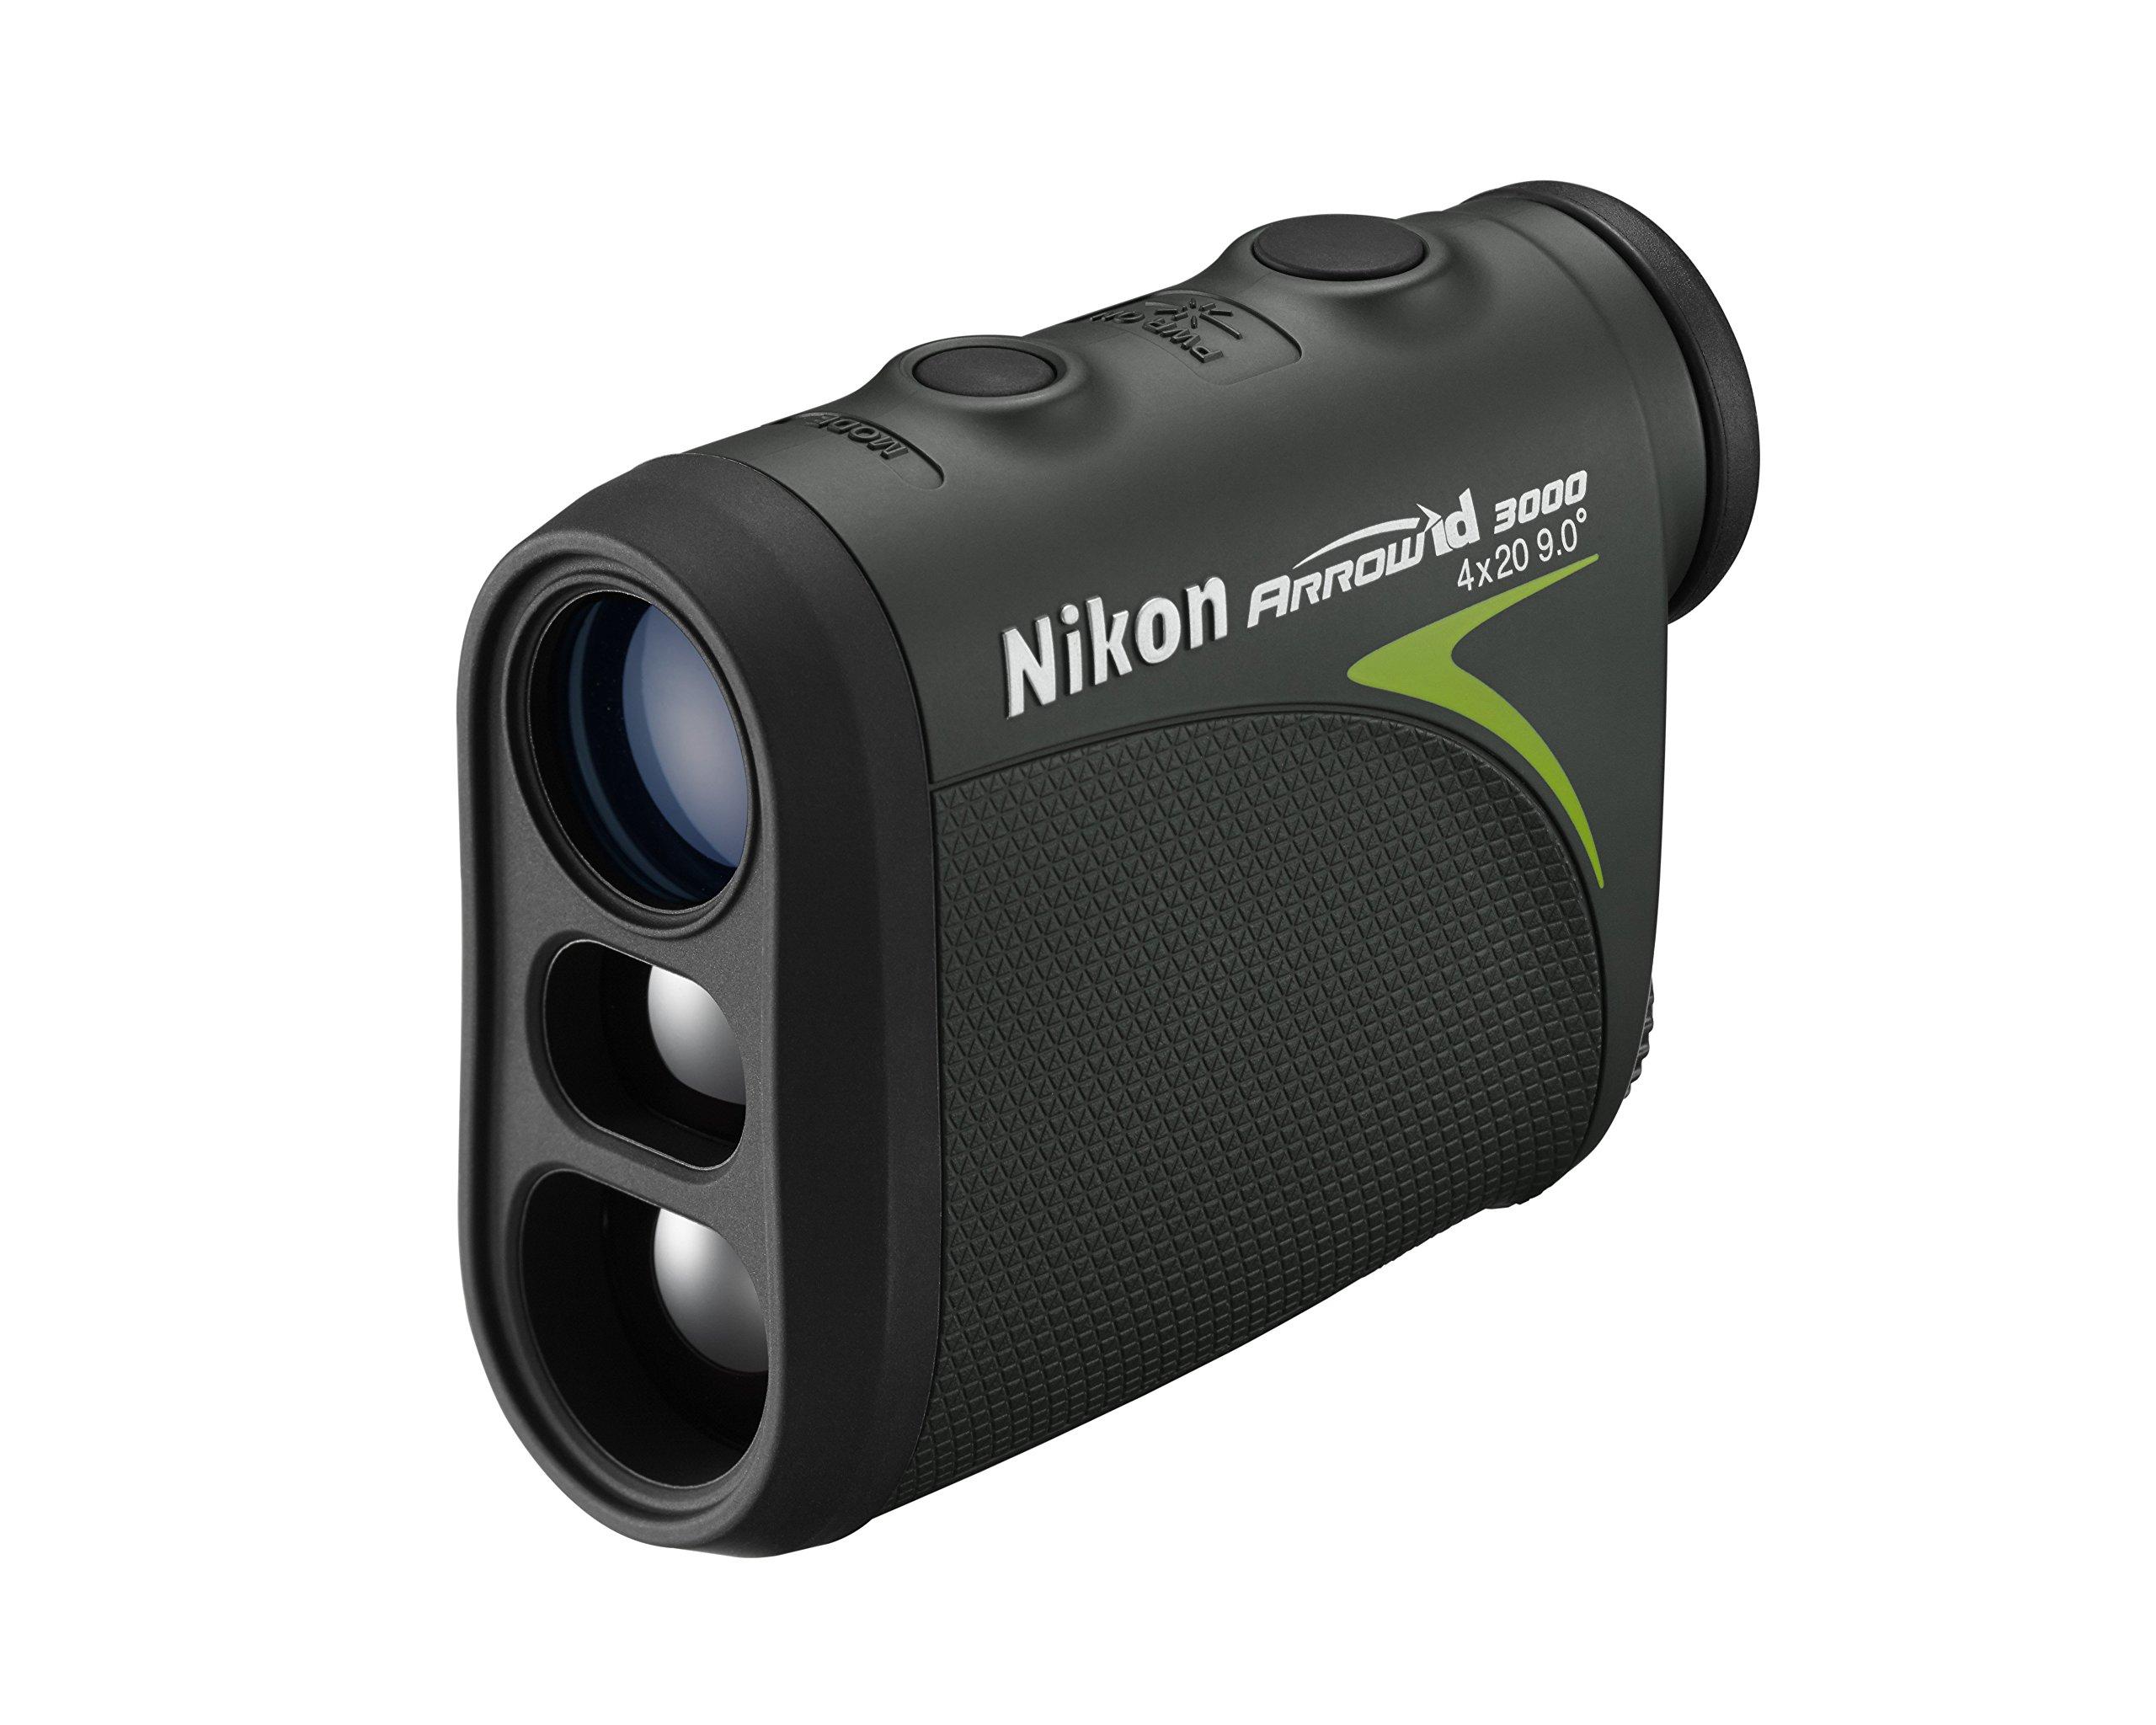 Nikon 16224 Arrow ID 3000 Bowhunting Laser Rangefinder by Nikon